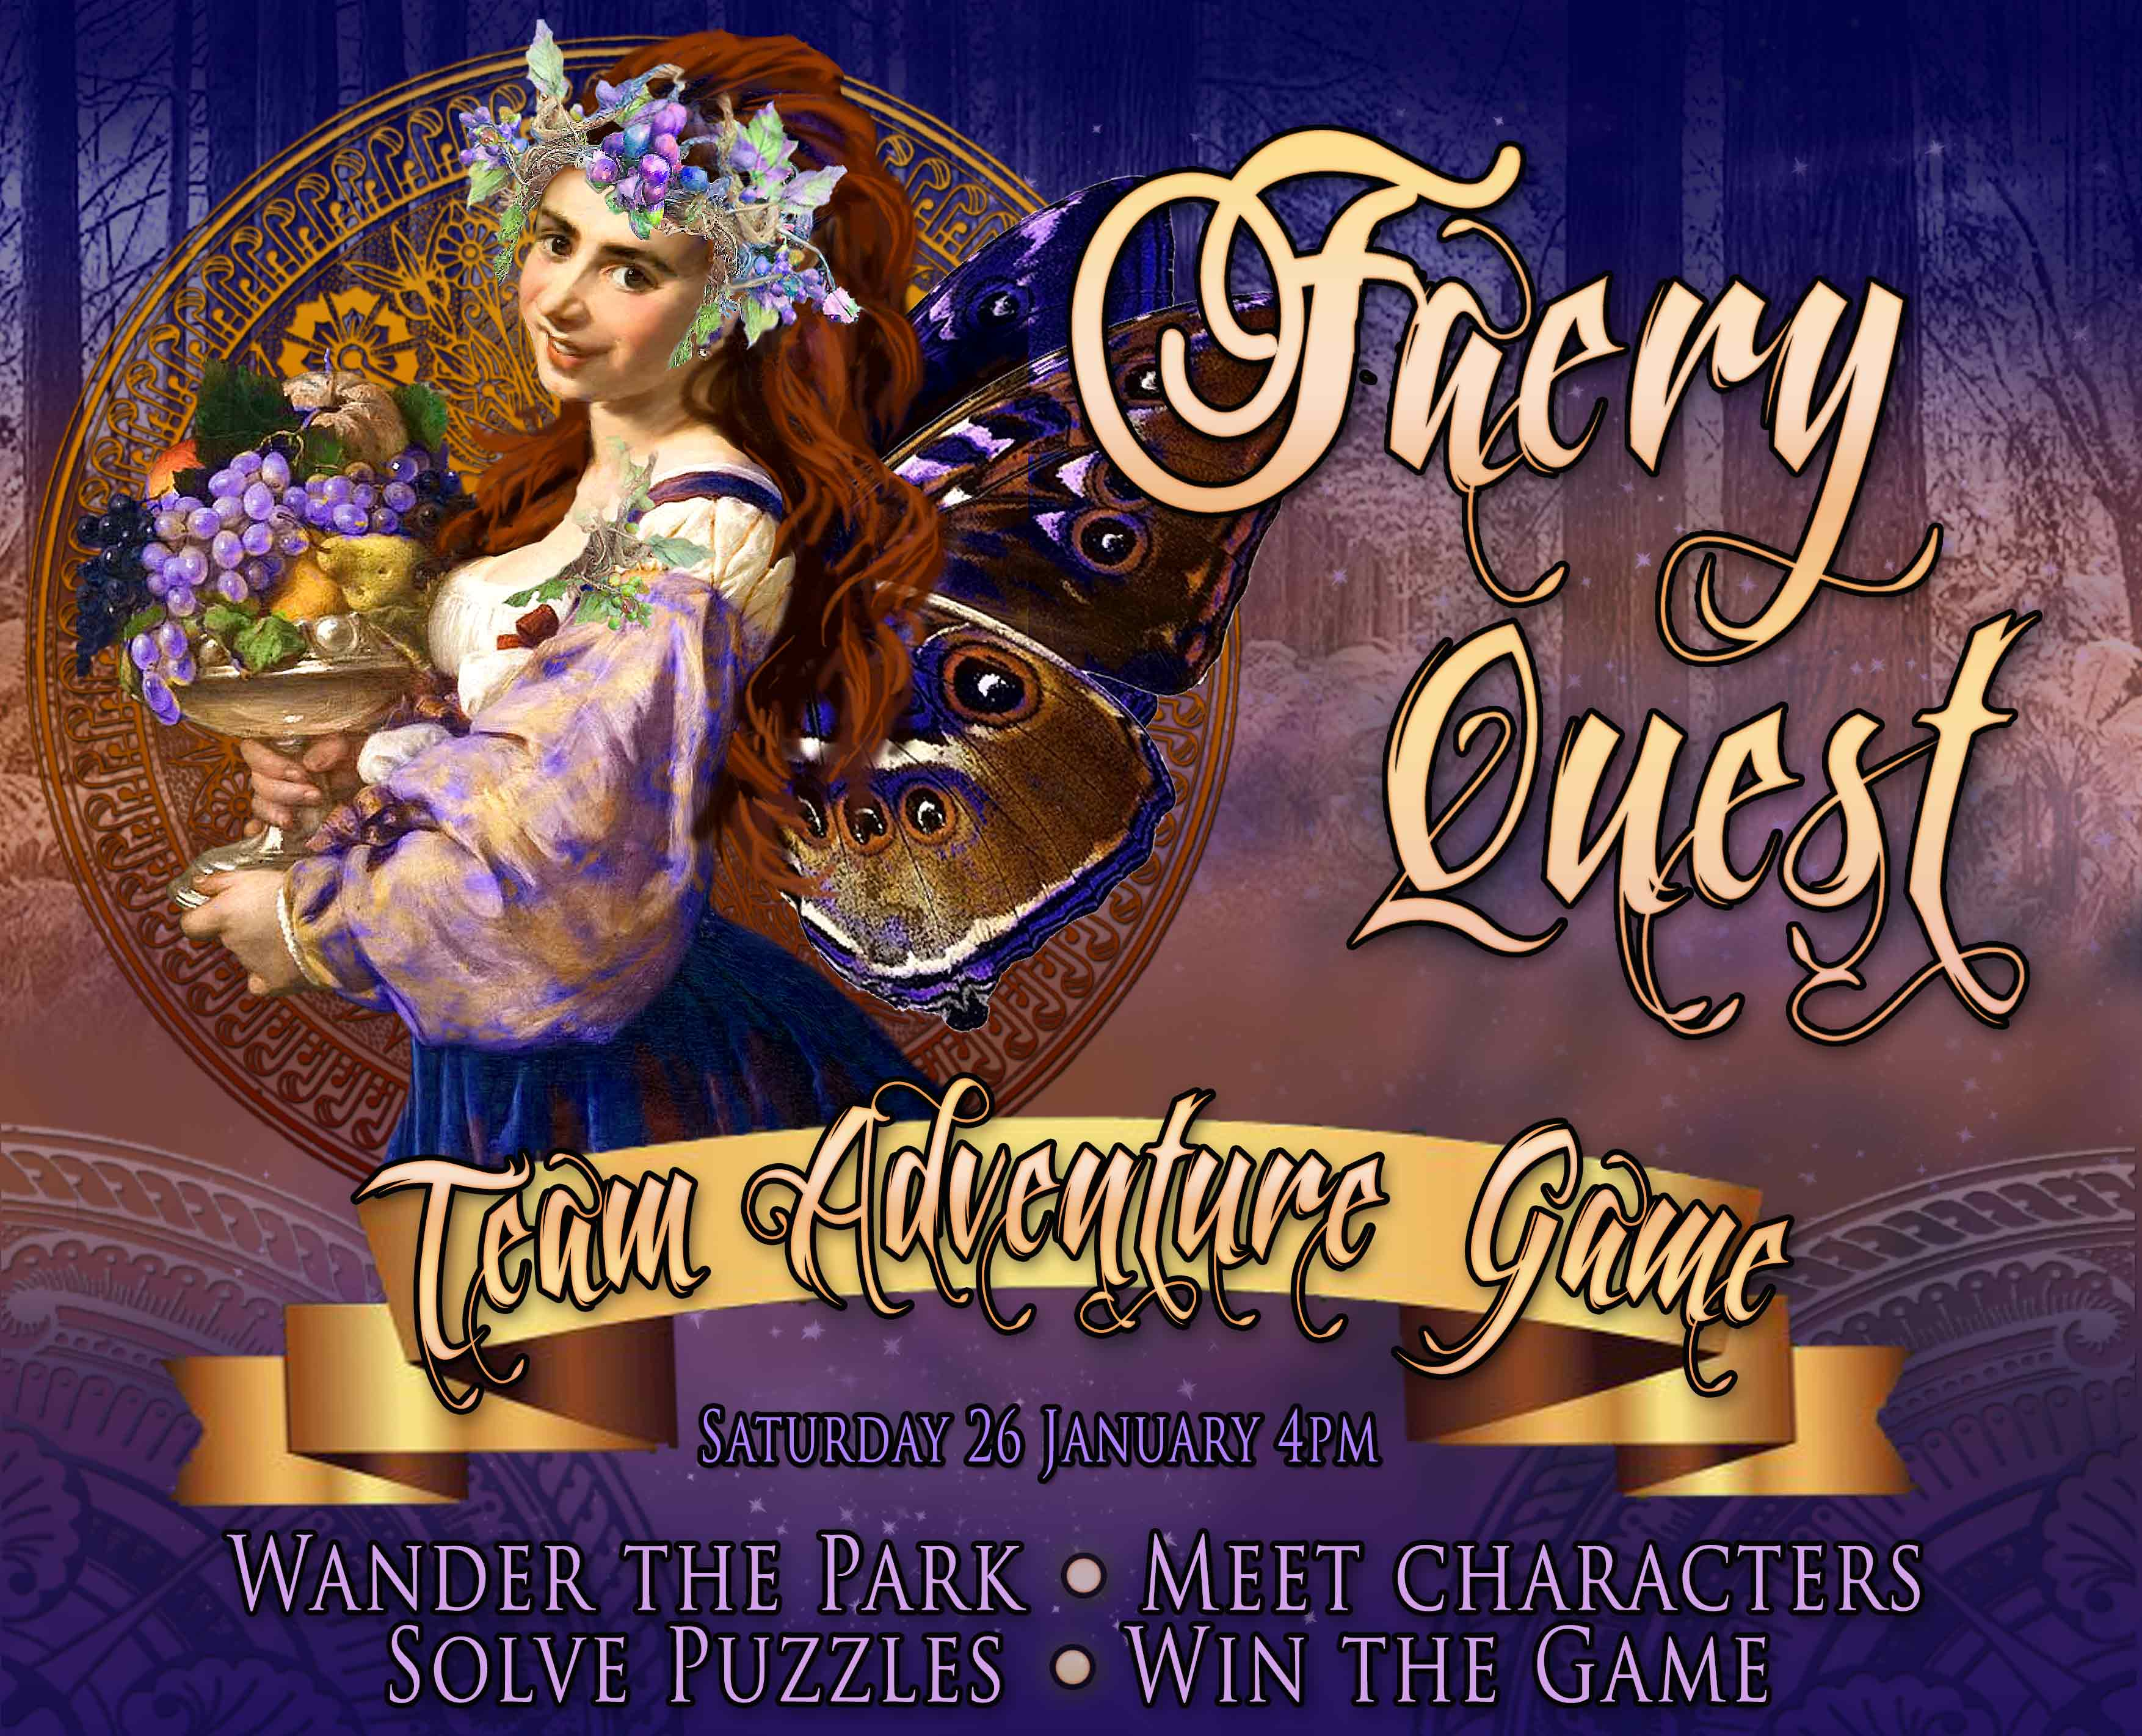 Faery Quest 2019